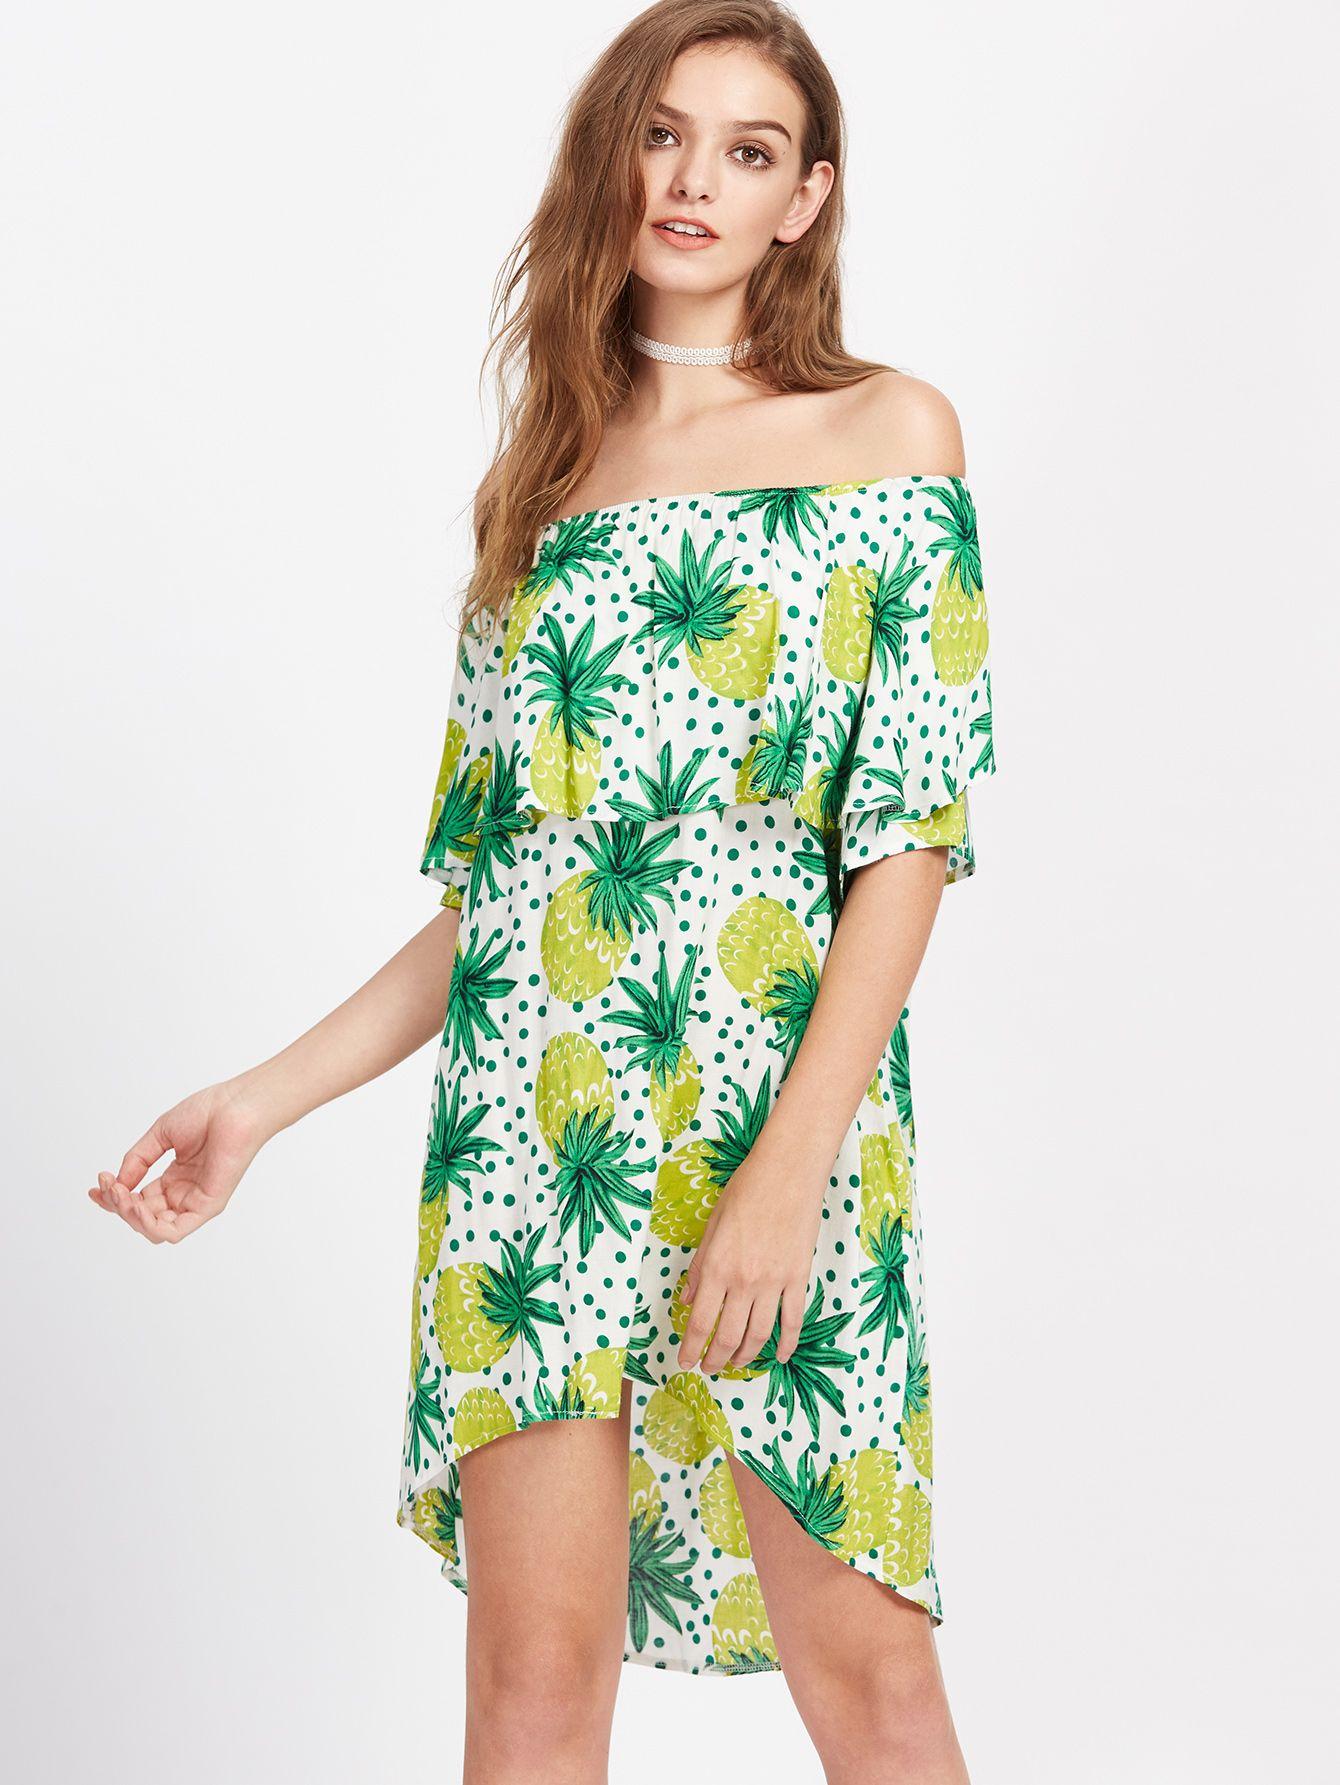 7496f4b4489 Shop Flounce Layered Neckline Pineapple Print Dip Hem Dress online. SheIn  offers Flounce Layered Neckline Pineapple Print Dip Hem Dress   more to fit  your ...